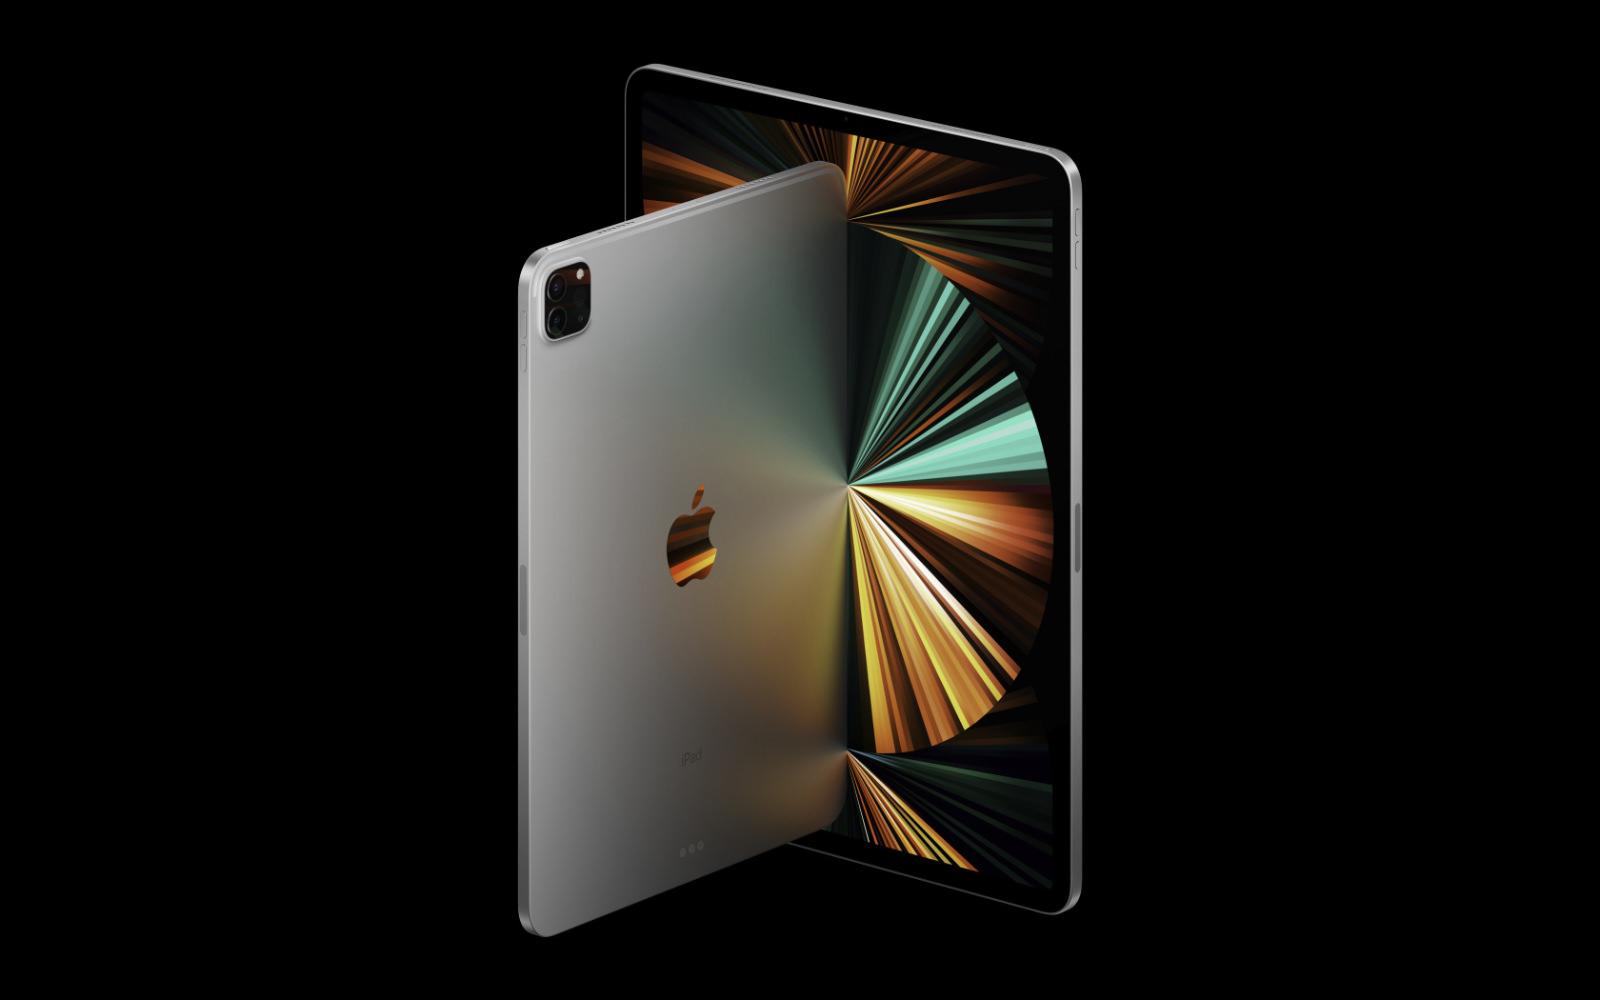 The New iPad Pro 2021 model